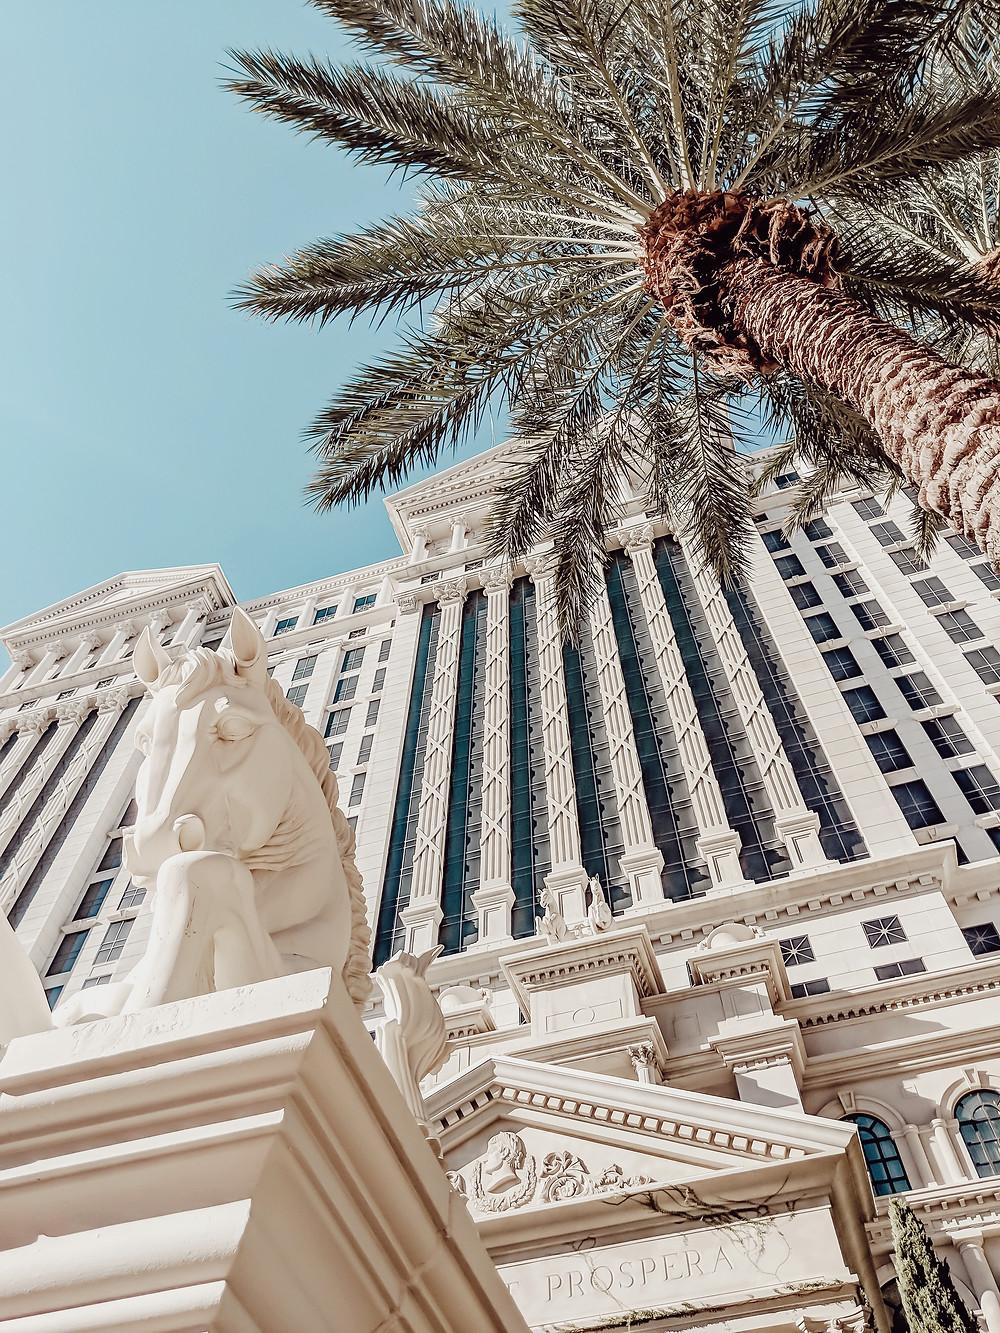 Caesars Palace Hotel and Casino